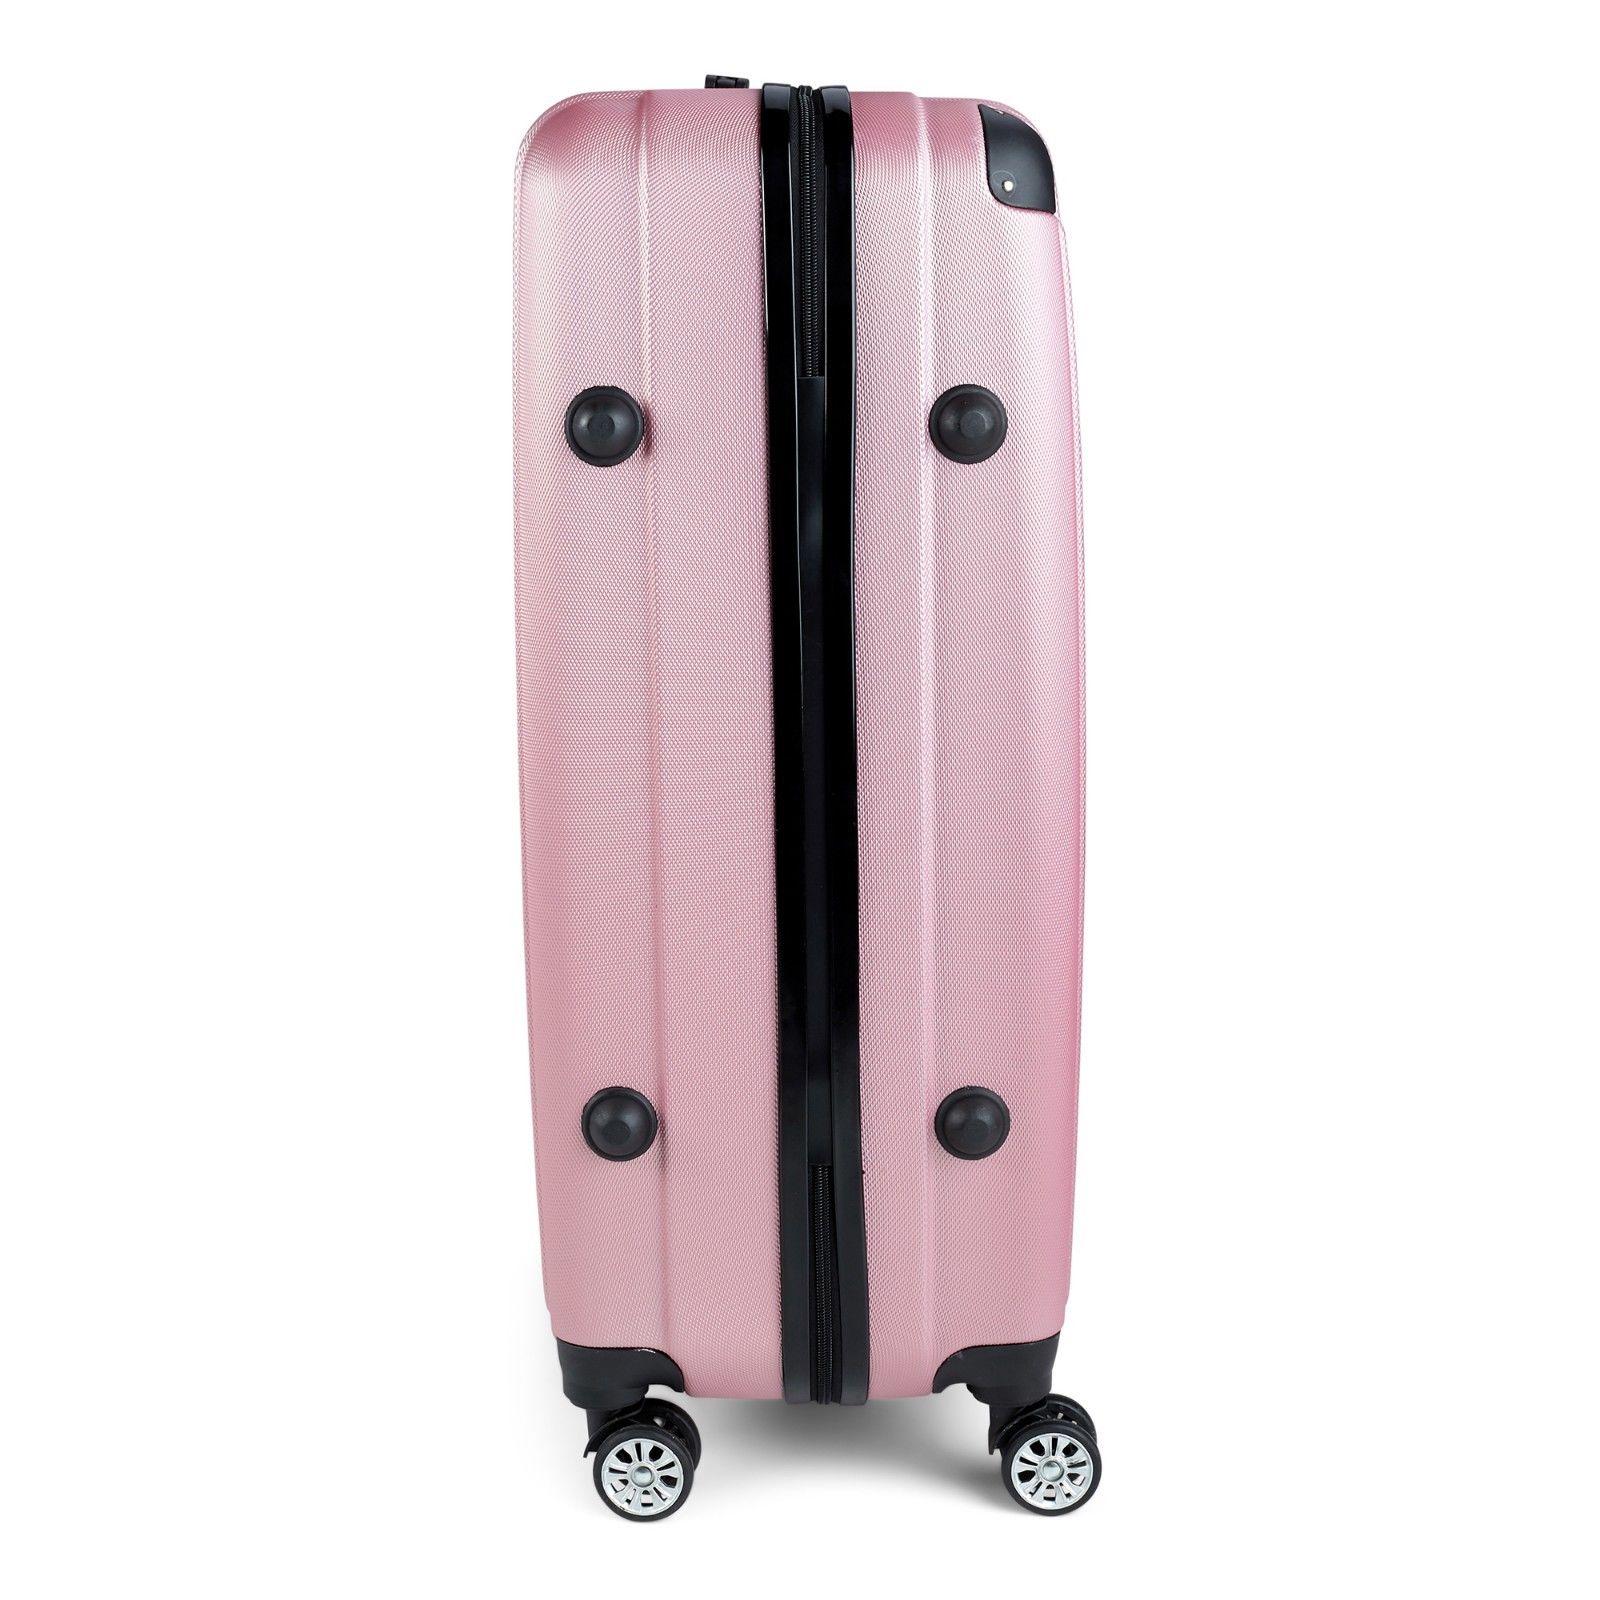 Milano-Premium-3pc-ABS-Luggage-Suitcase-Luxury-Hard-Case-Shockproof-Travel-Set thumbnail 23